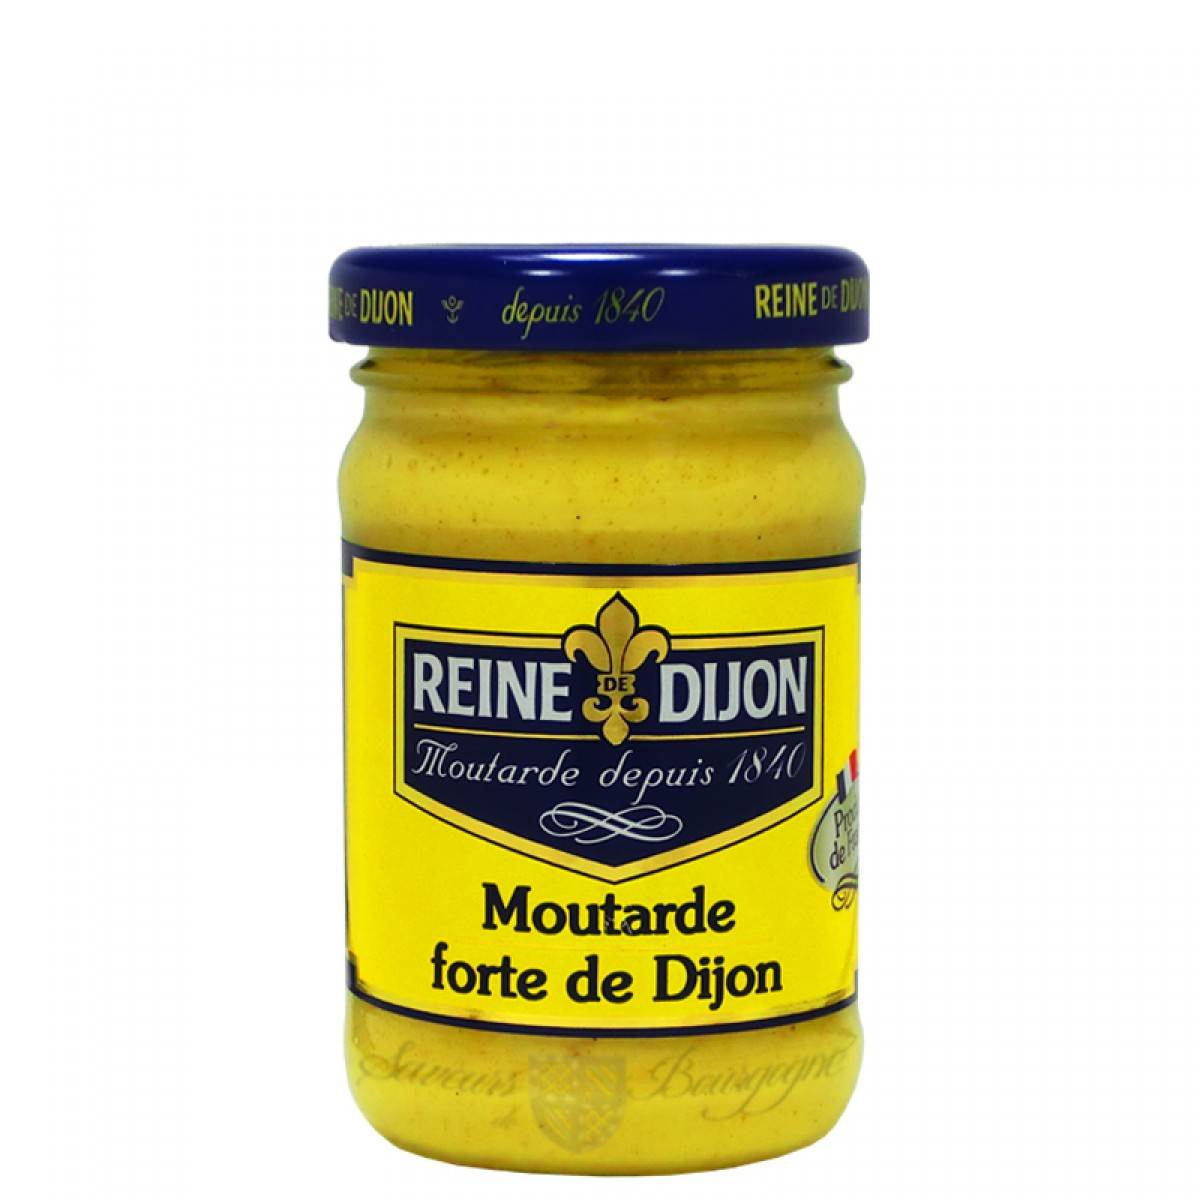 Moutarde forte de dijon 100g saveurs de bourgogne vente de produits du te - Moutarde fallot vente ...